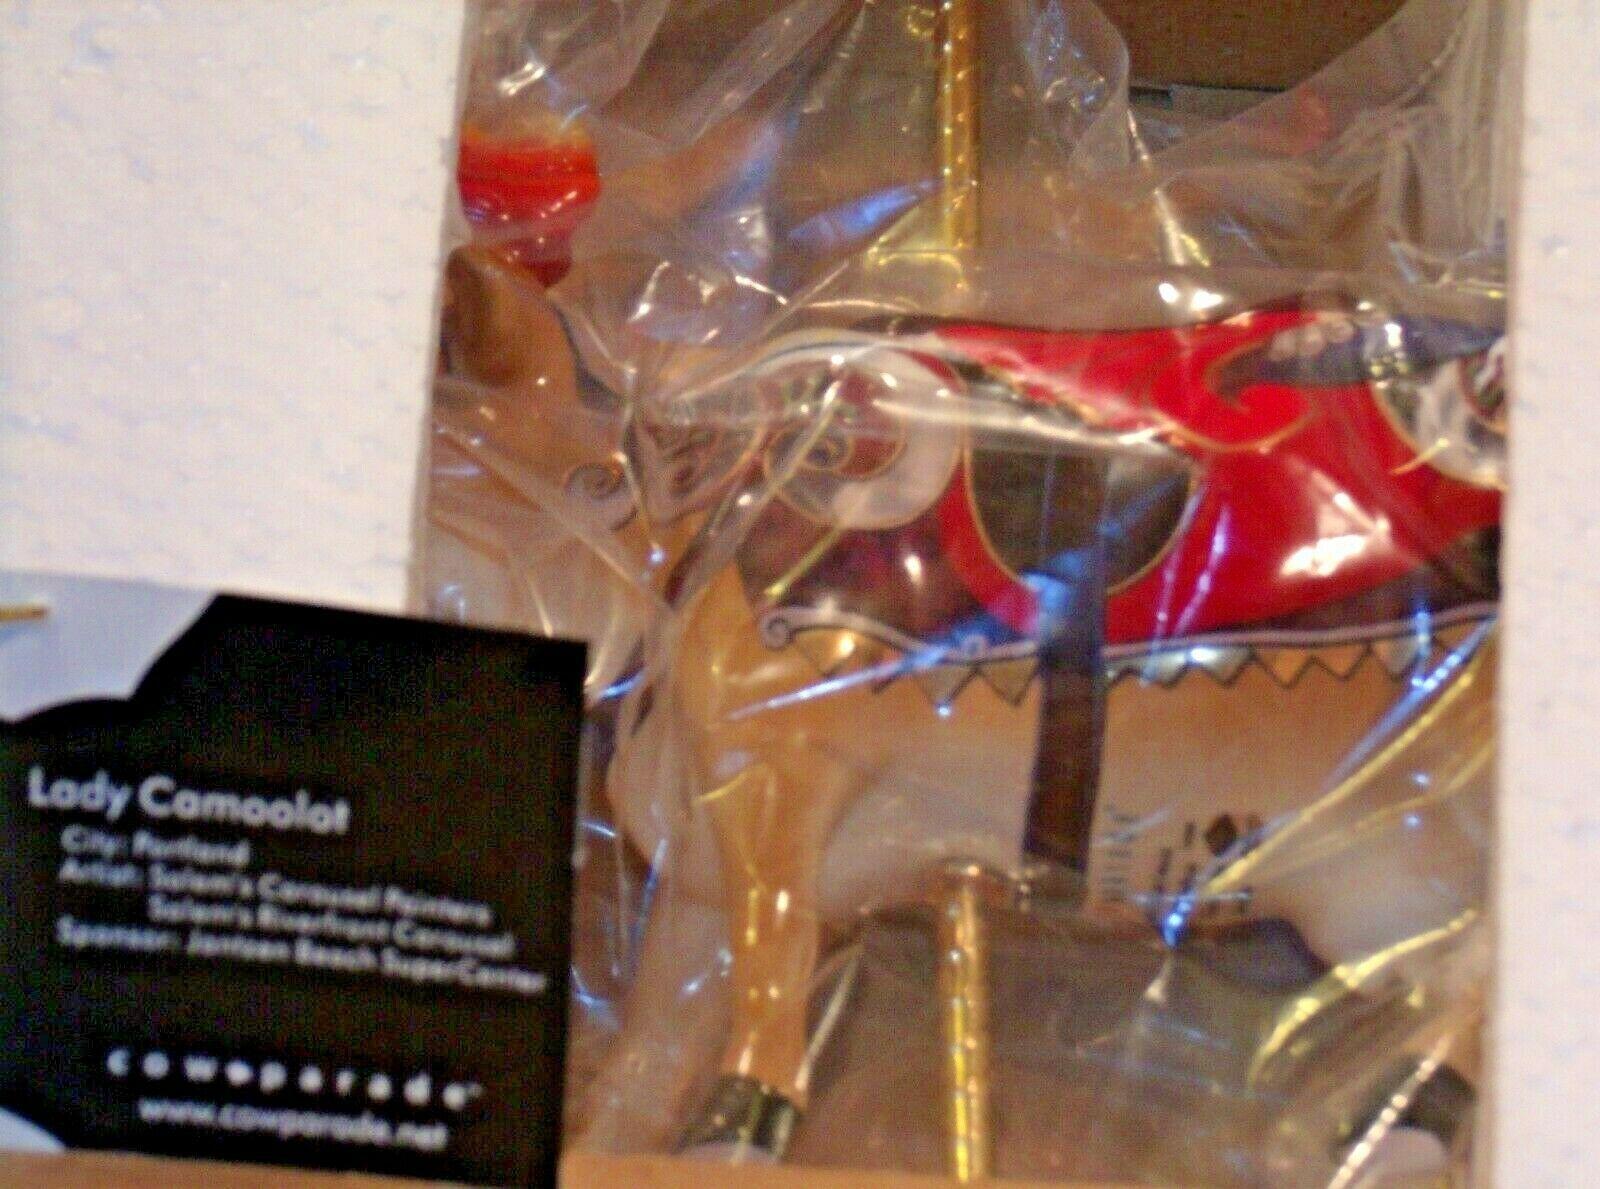 CowParade Lady Camoolot Westland Giftware # 7315 AA-191951 Collectible